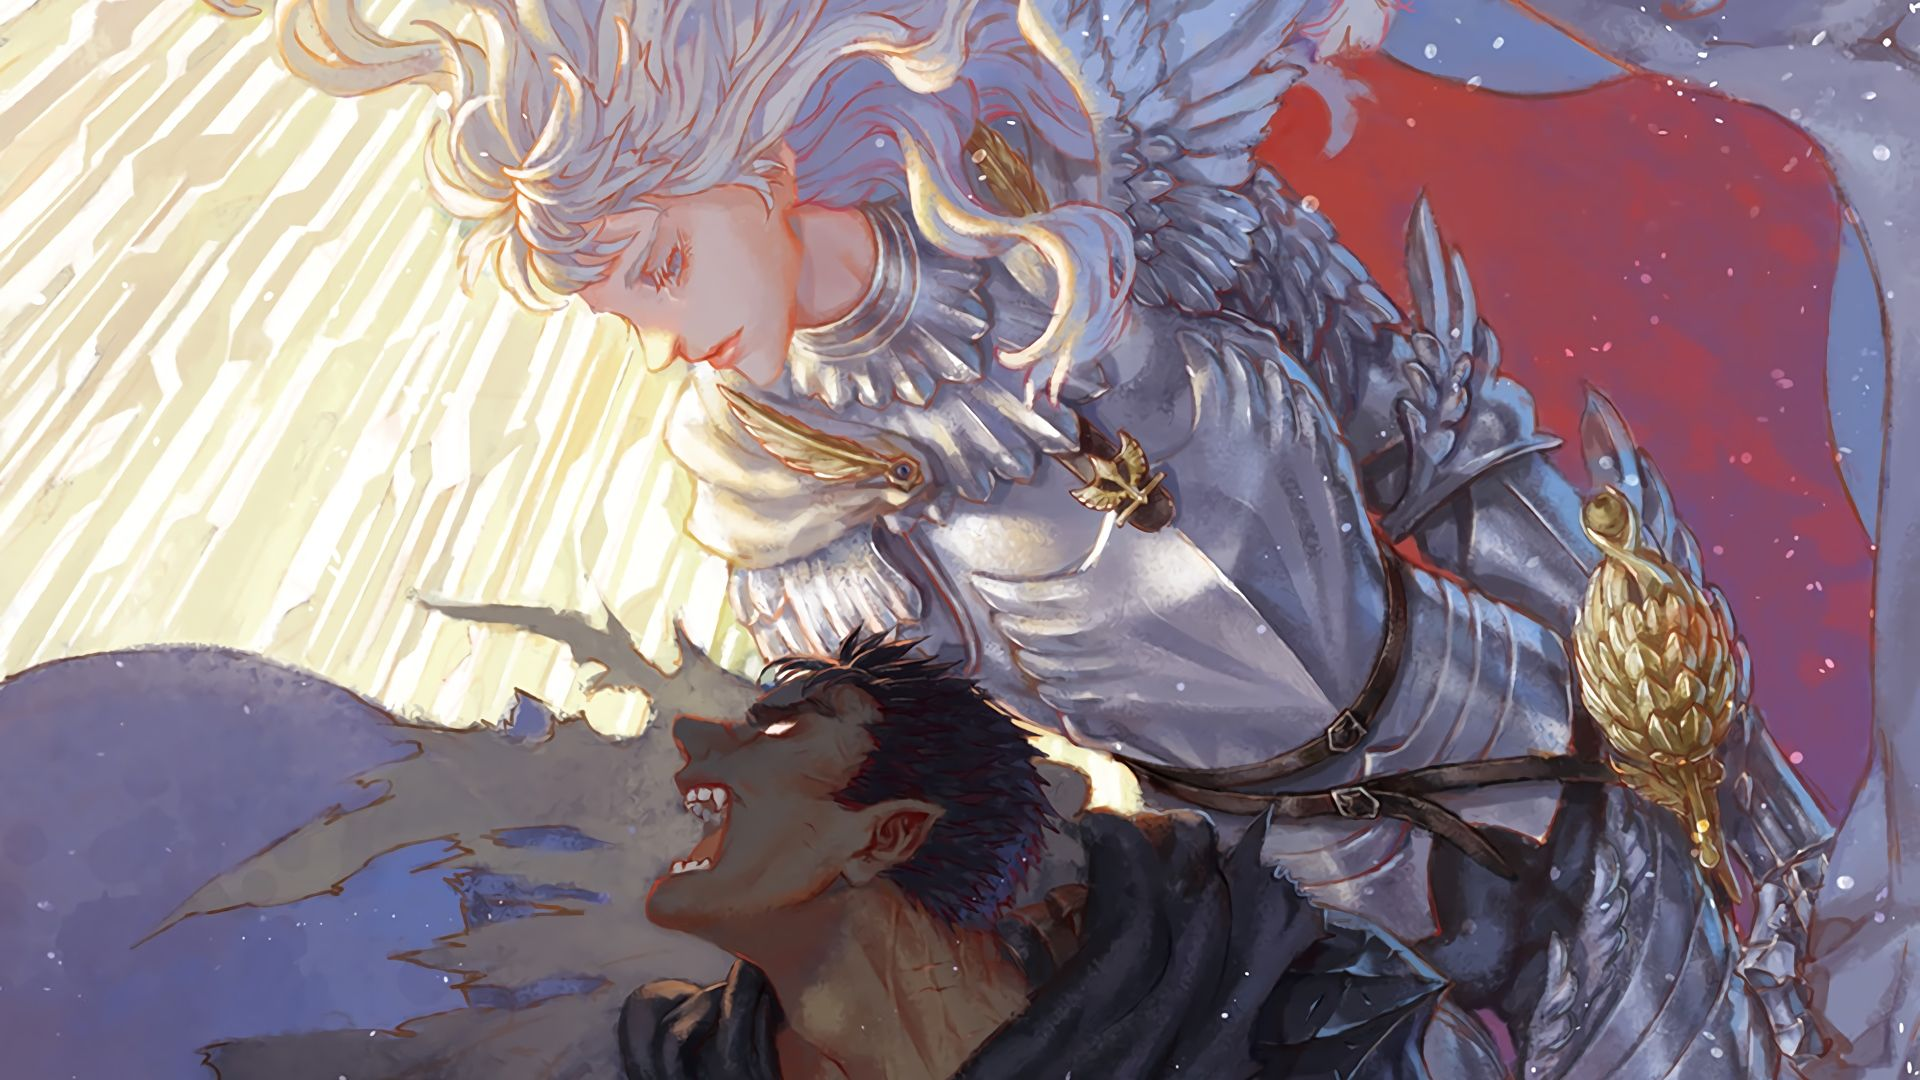 Guts and Griffith Berserk Anime Wallpaper Anime